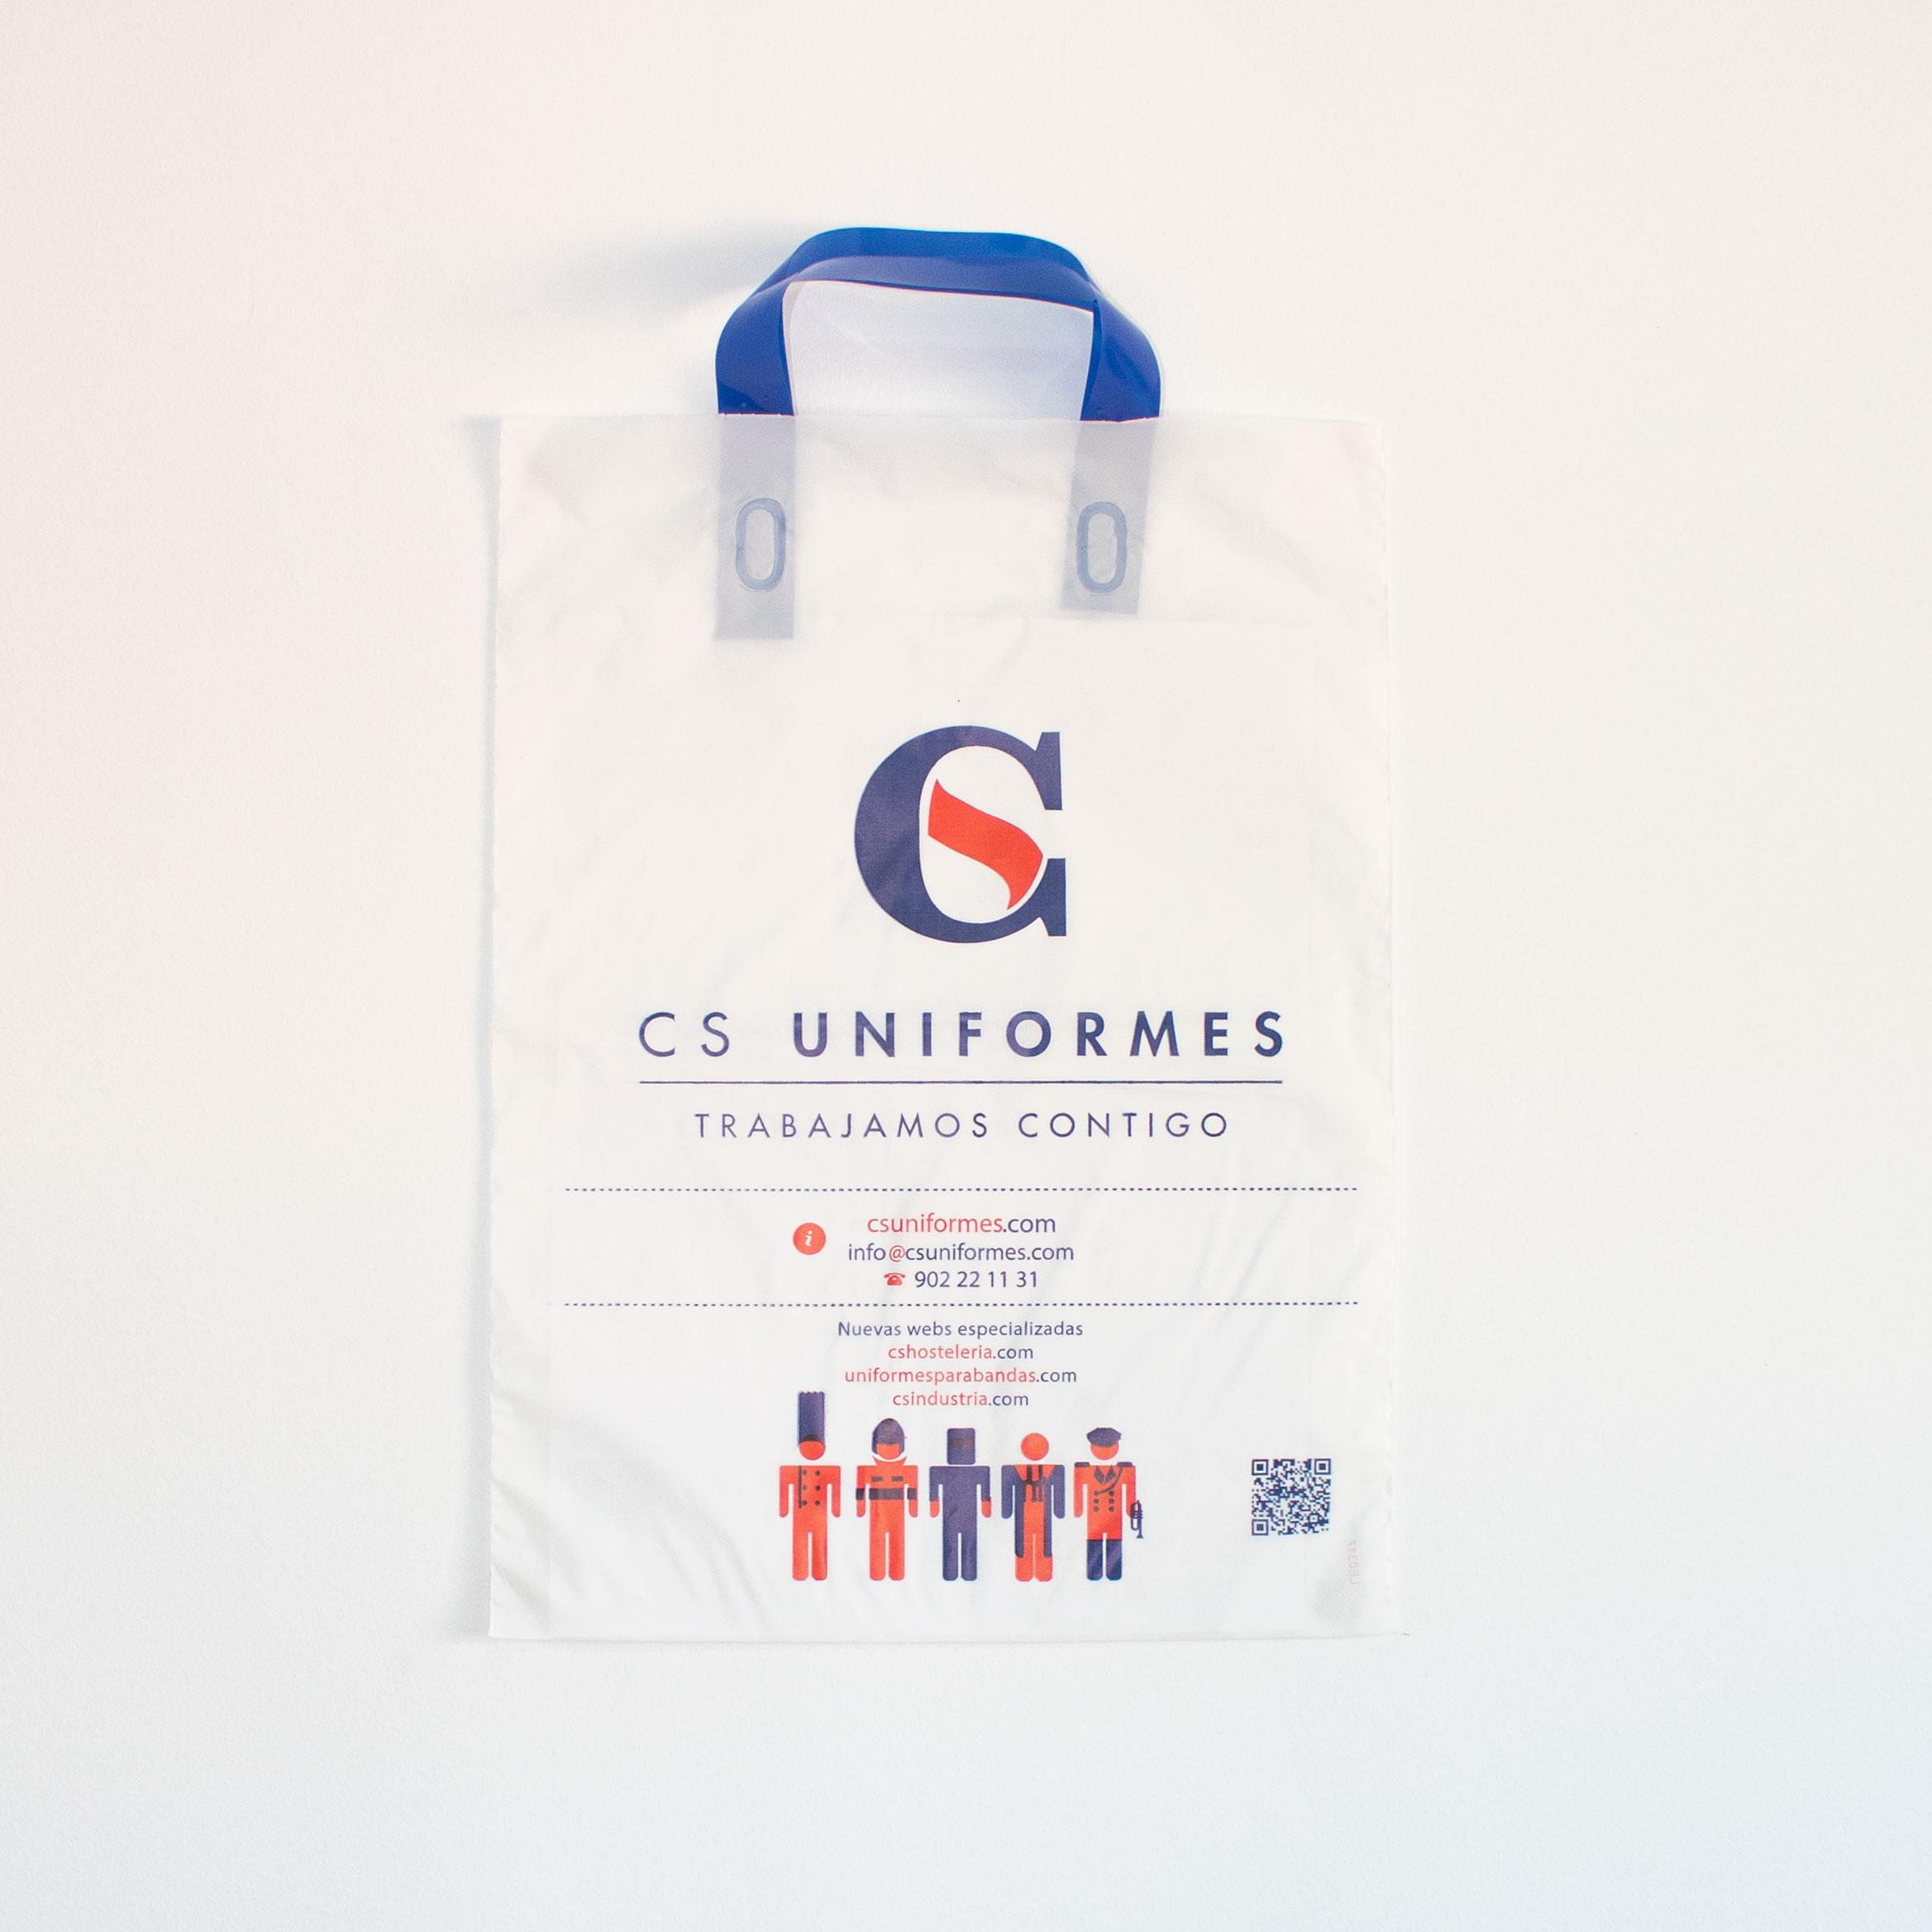 cs-uniformes-bolsa-asa-lazo-plasticos-canguro